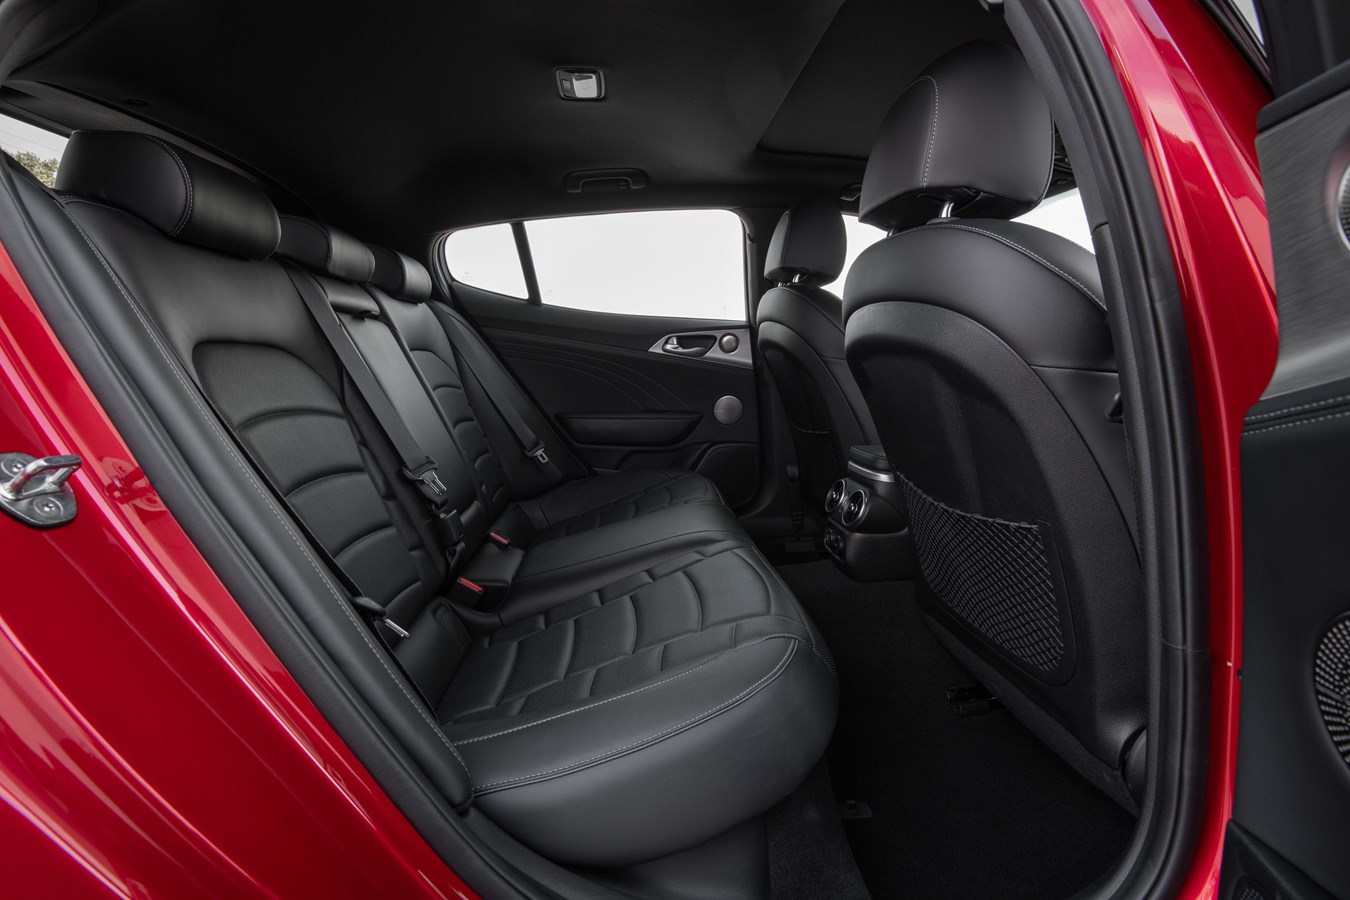 2022 Stinger GT interior rear seat